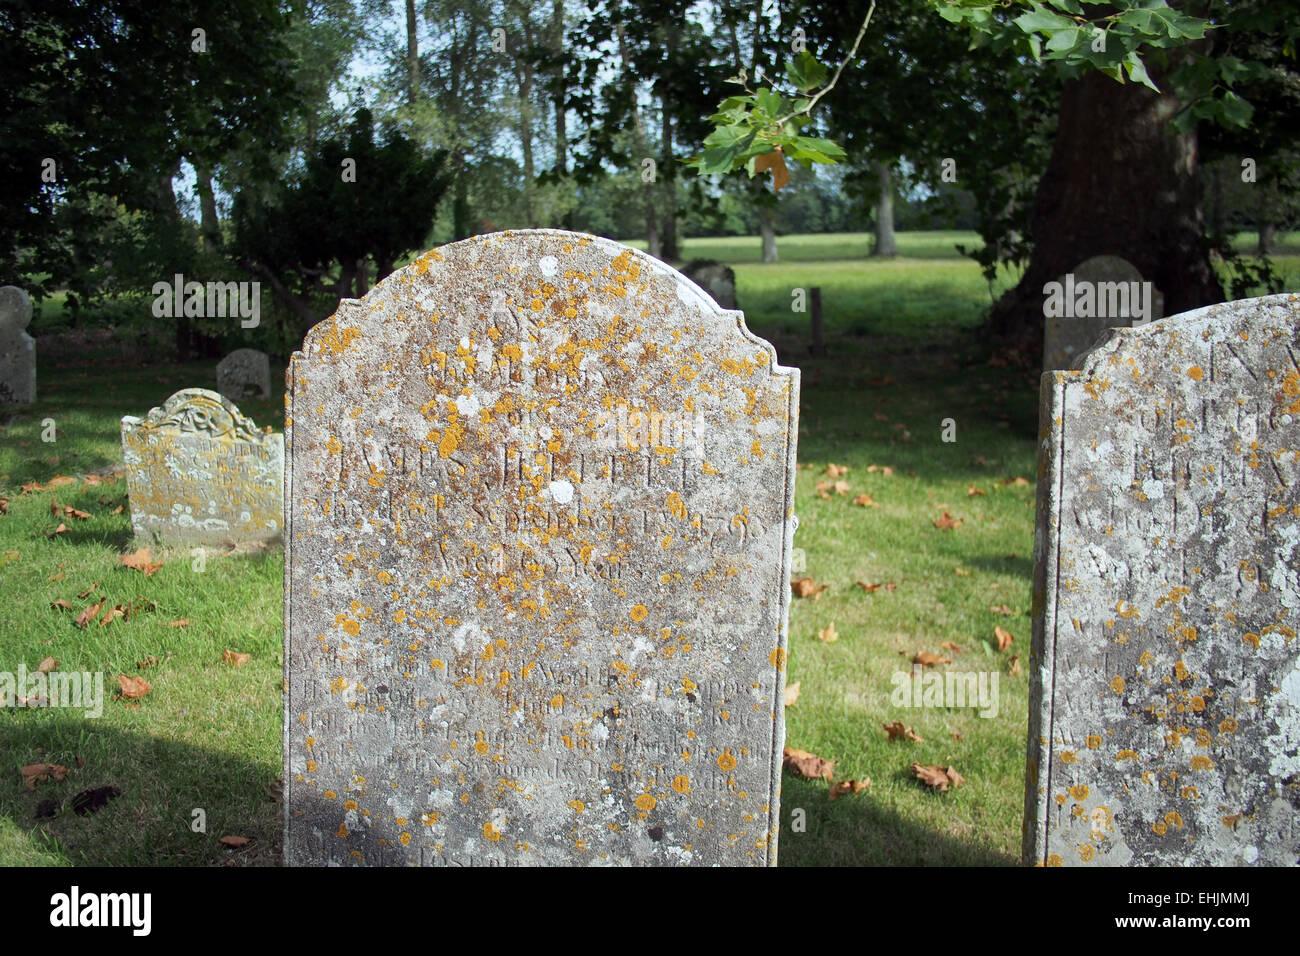 gravestones in a cemetery graveyard in  England UK - Stock Image